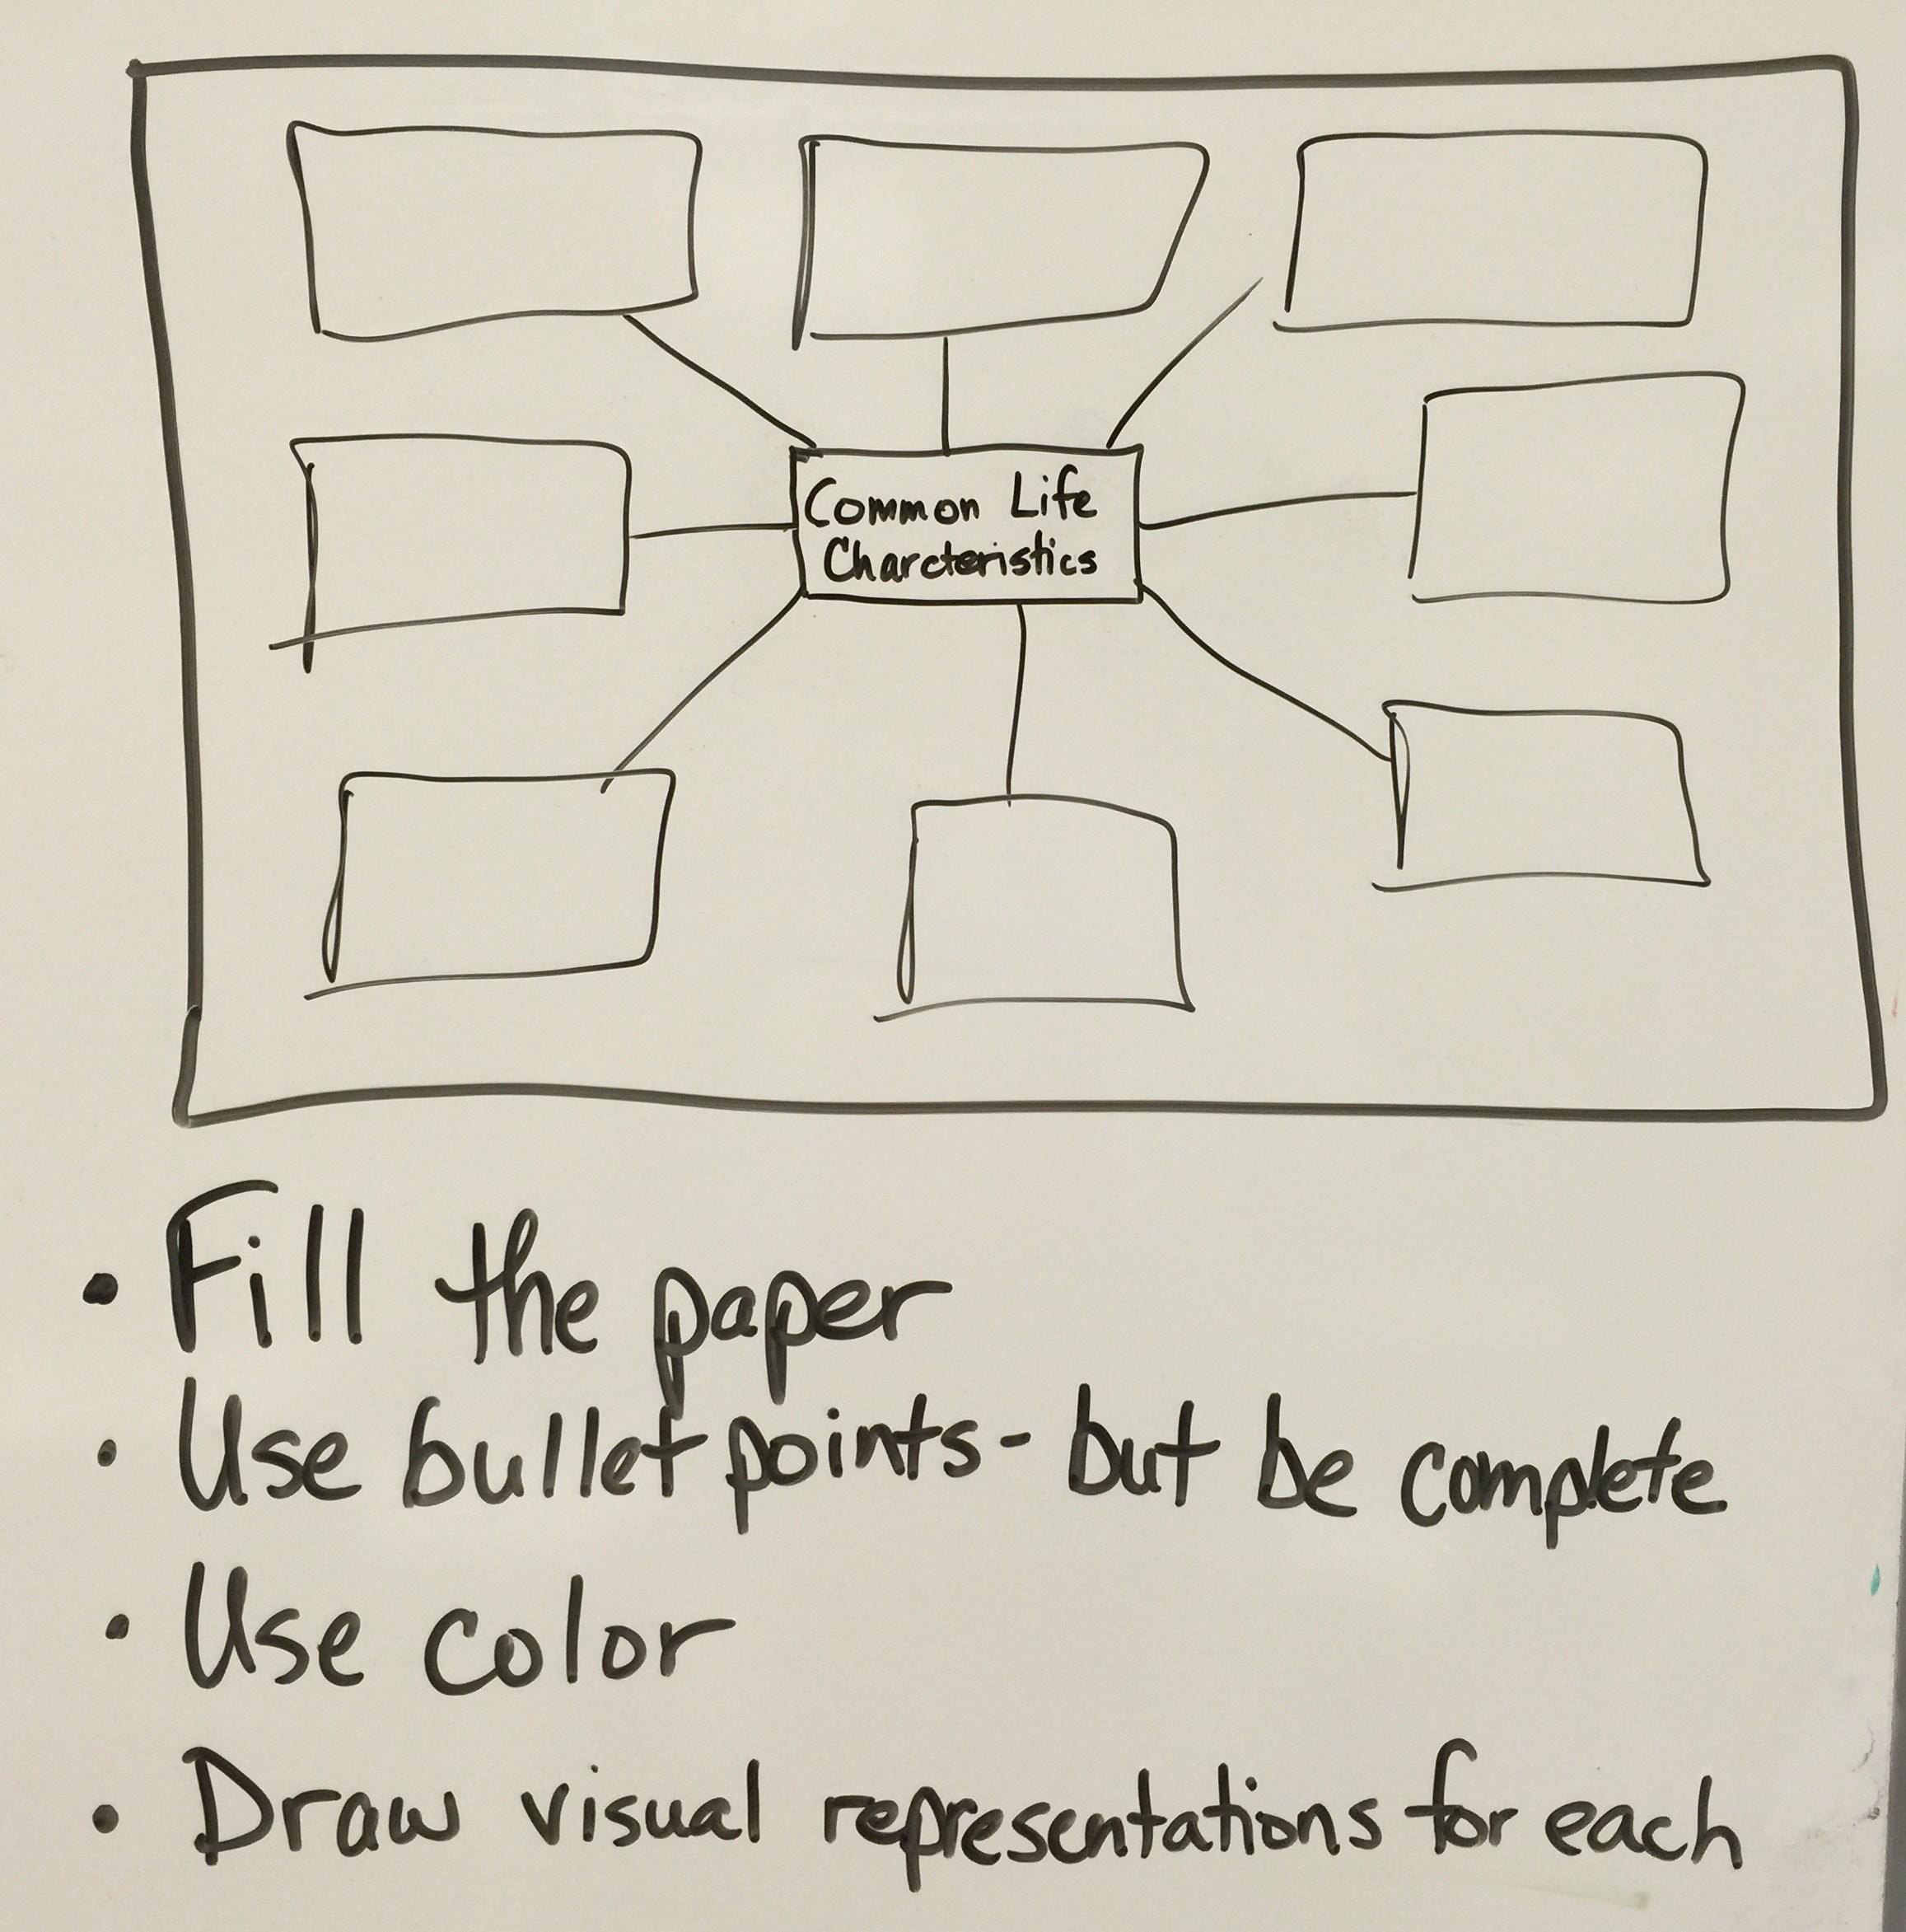 La mirada high school charcteristics of life graphic organizer sampleg pooptronica